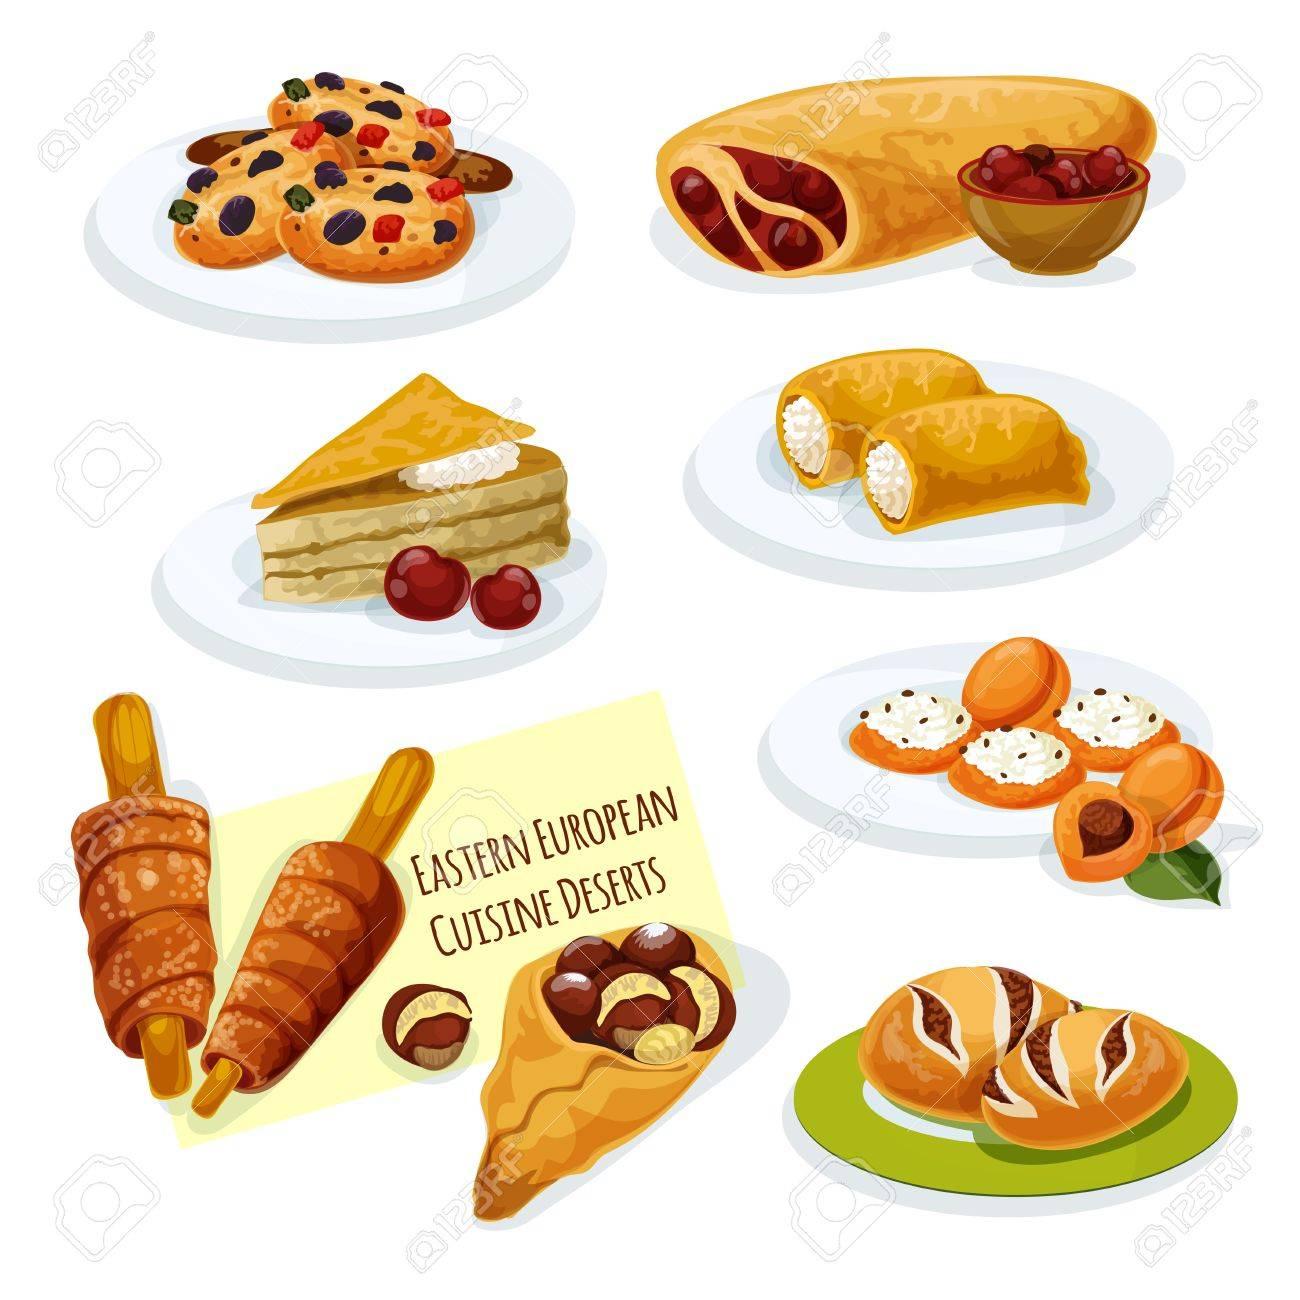 Eastern European Cuisine Desserts Cartoon Icon With Cherry Strudel